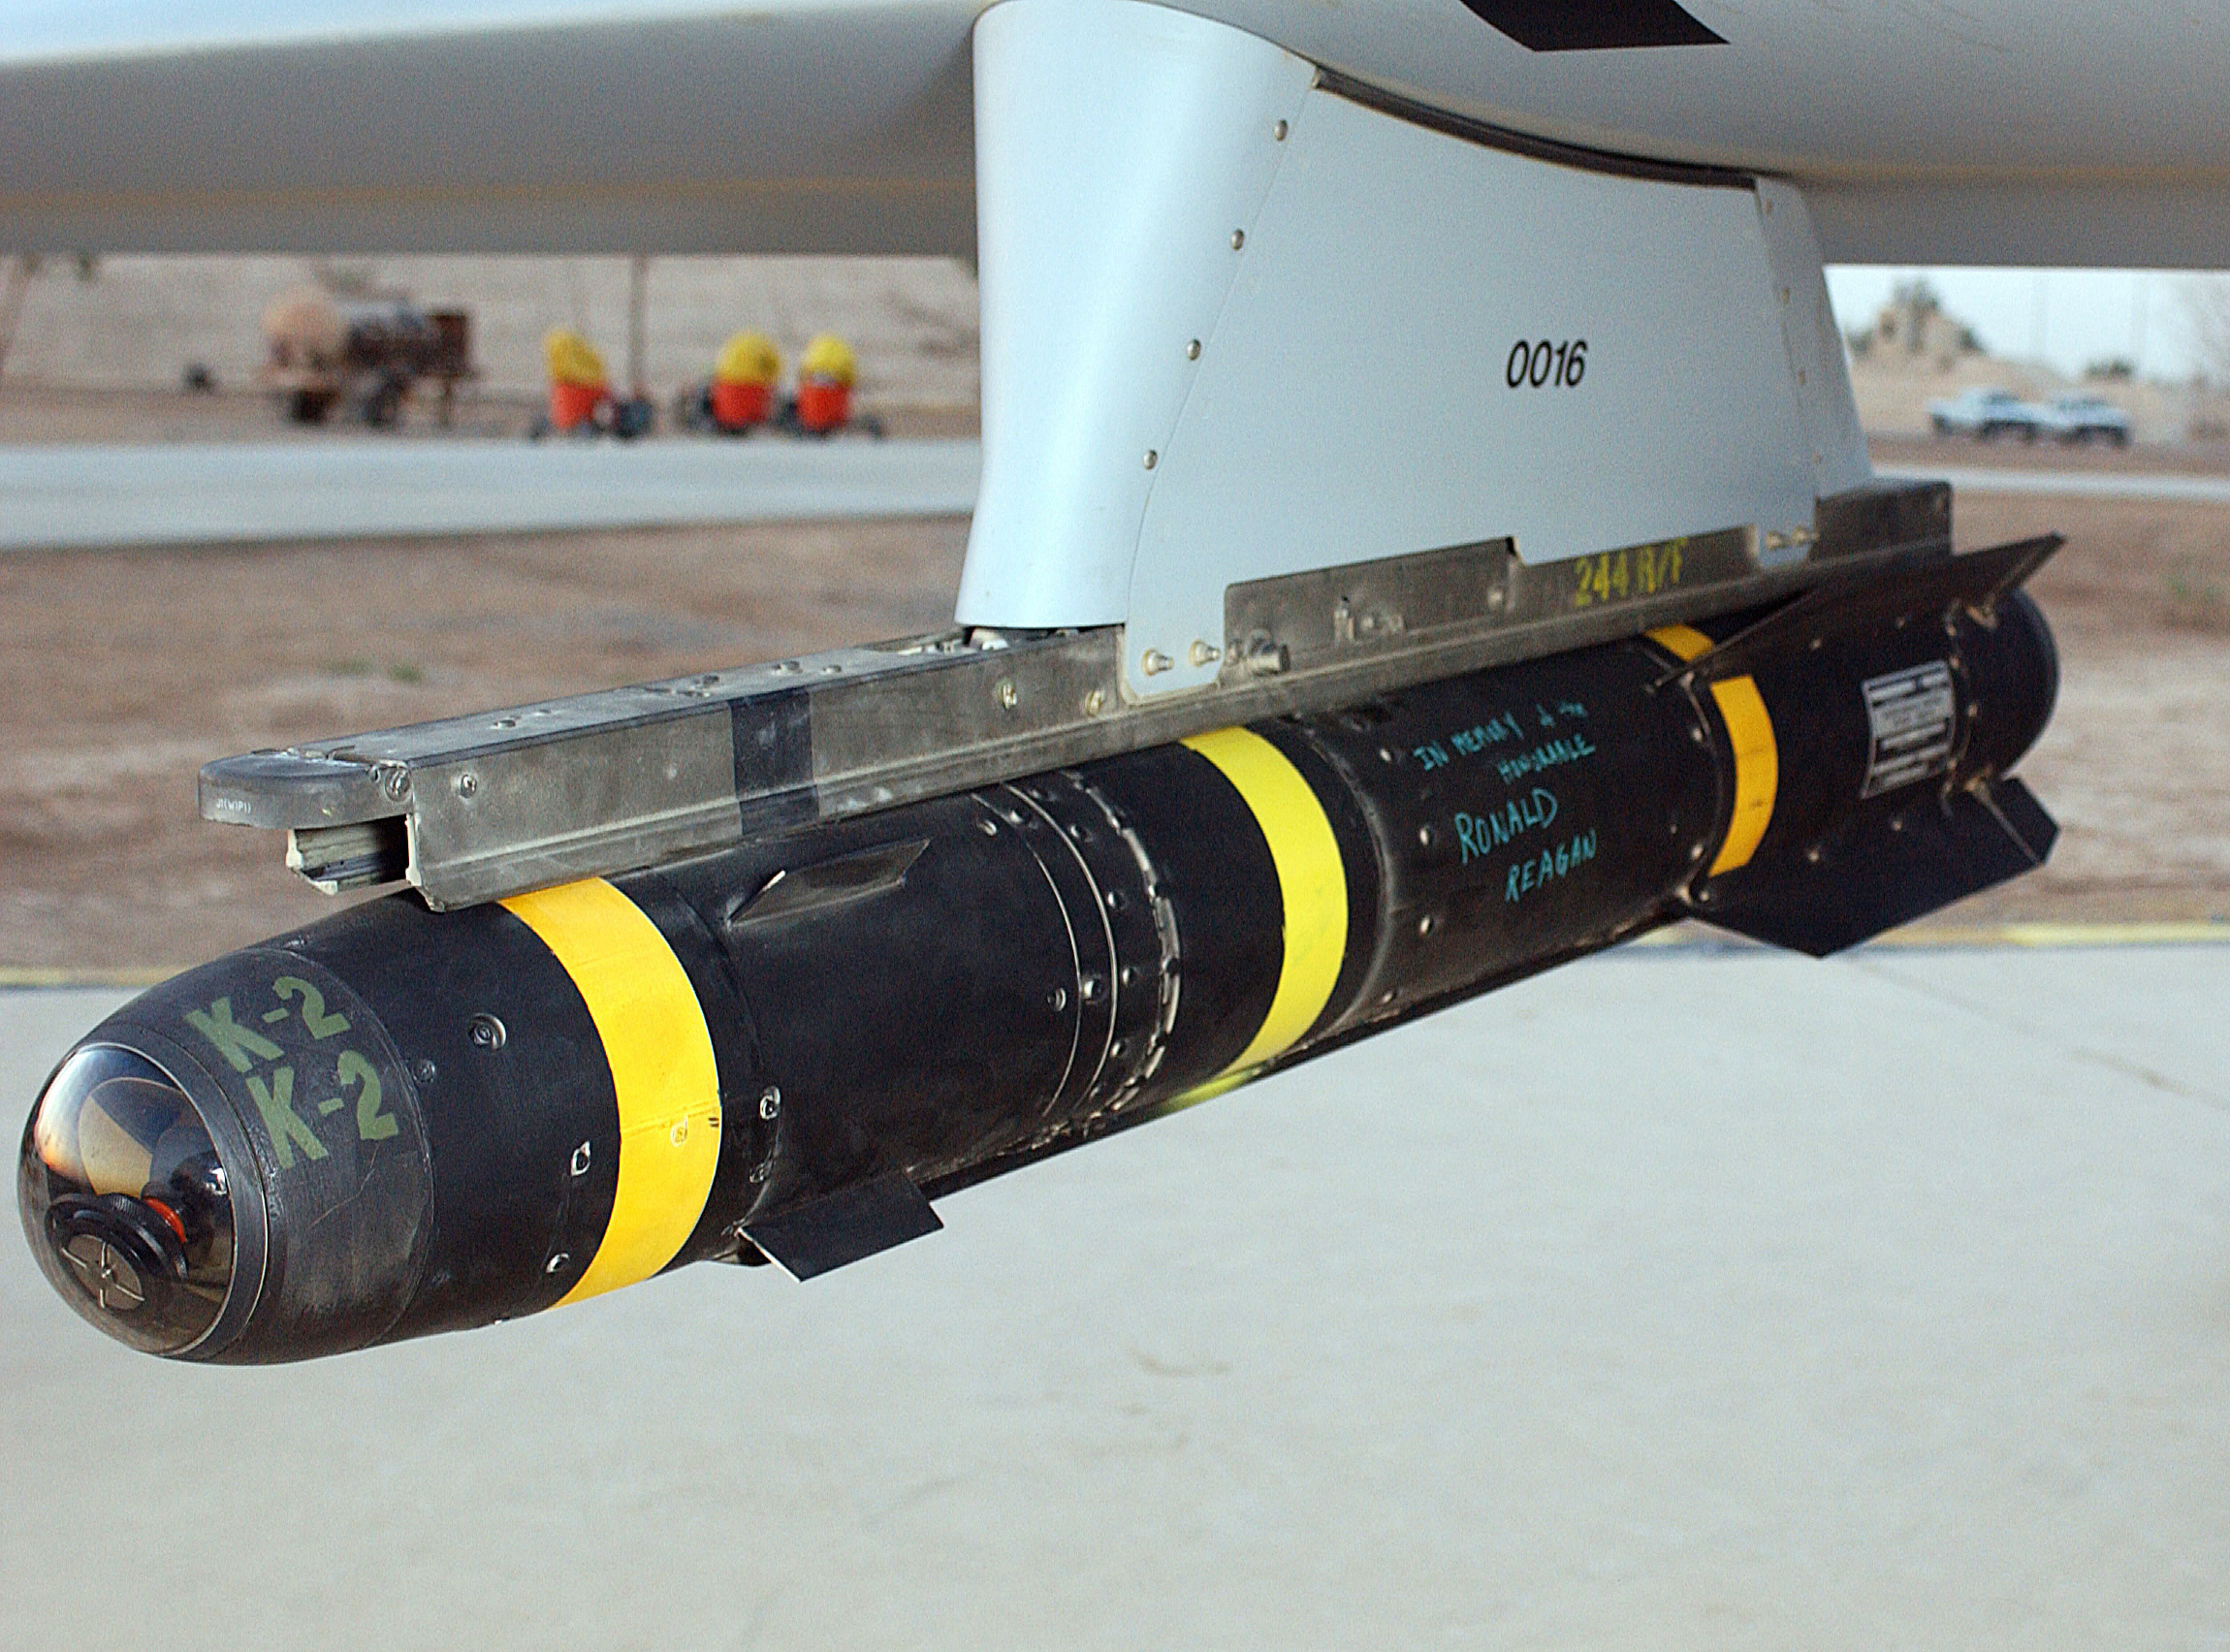 armée americaine - Page 2 AGM-114_Hellfire_hung_on_a_Predator_drone